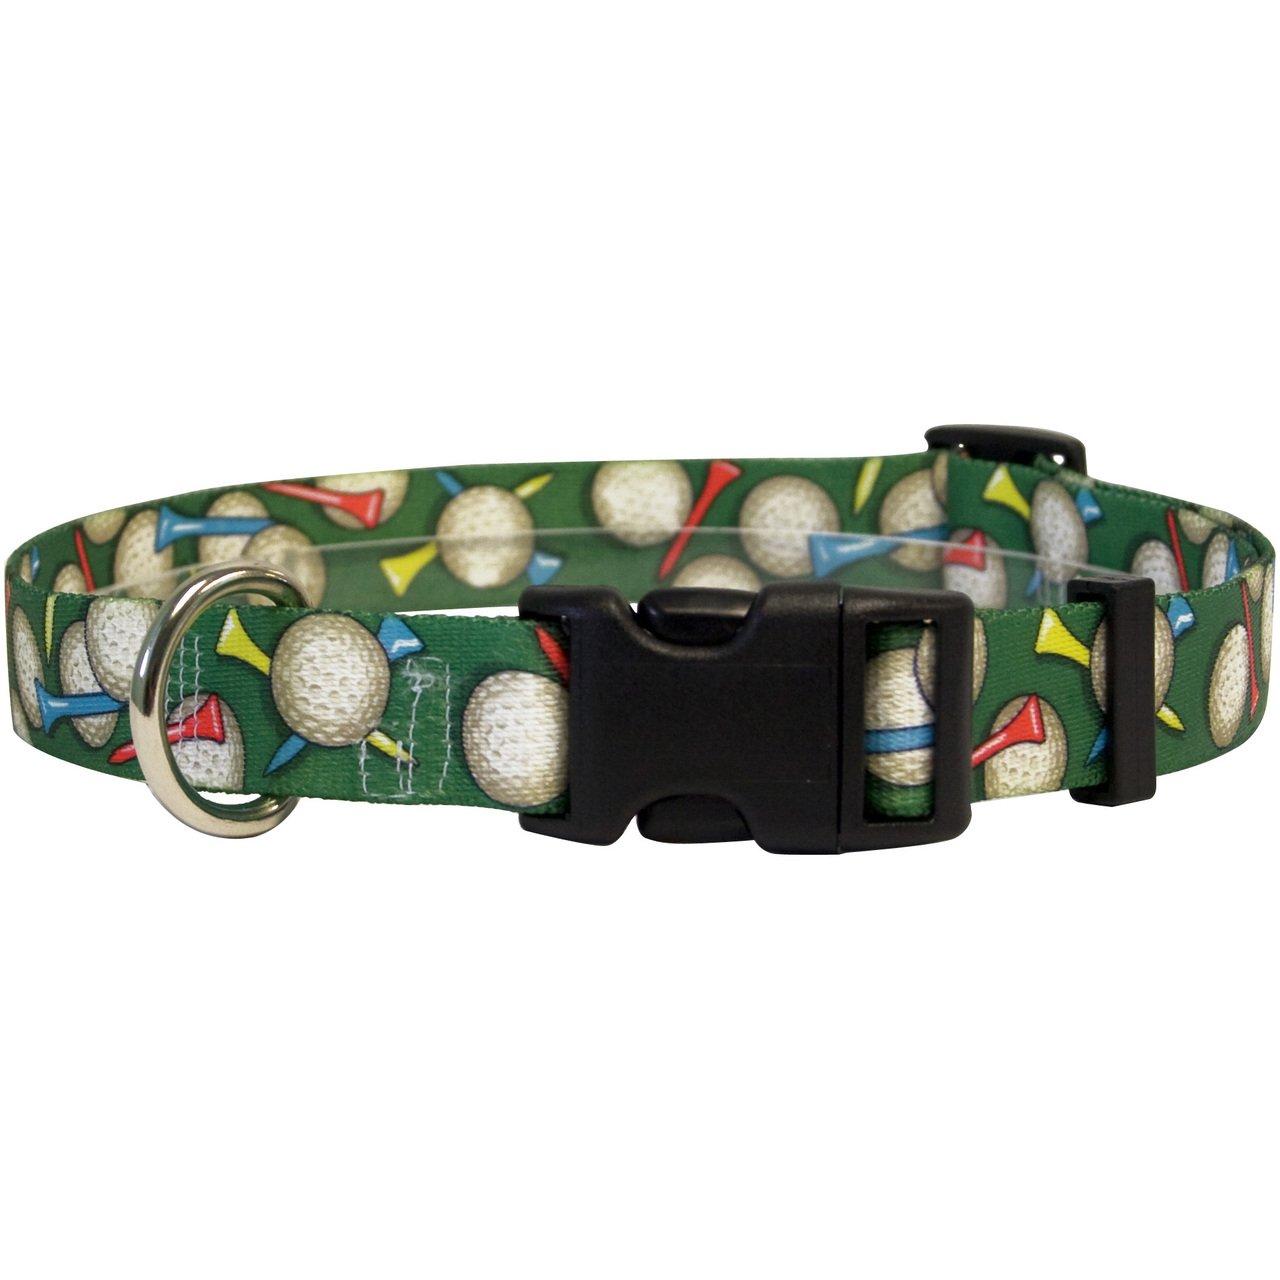 Yellow Dog Design Golf Balls Dog Collar Fits Neck 14 to 20''/4'' Wide, Medium 3/4'' Wide by Yellow Dog Design